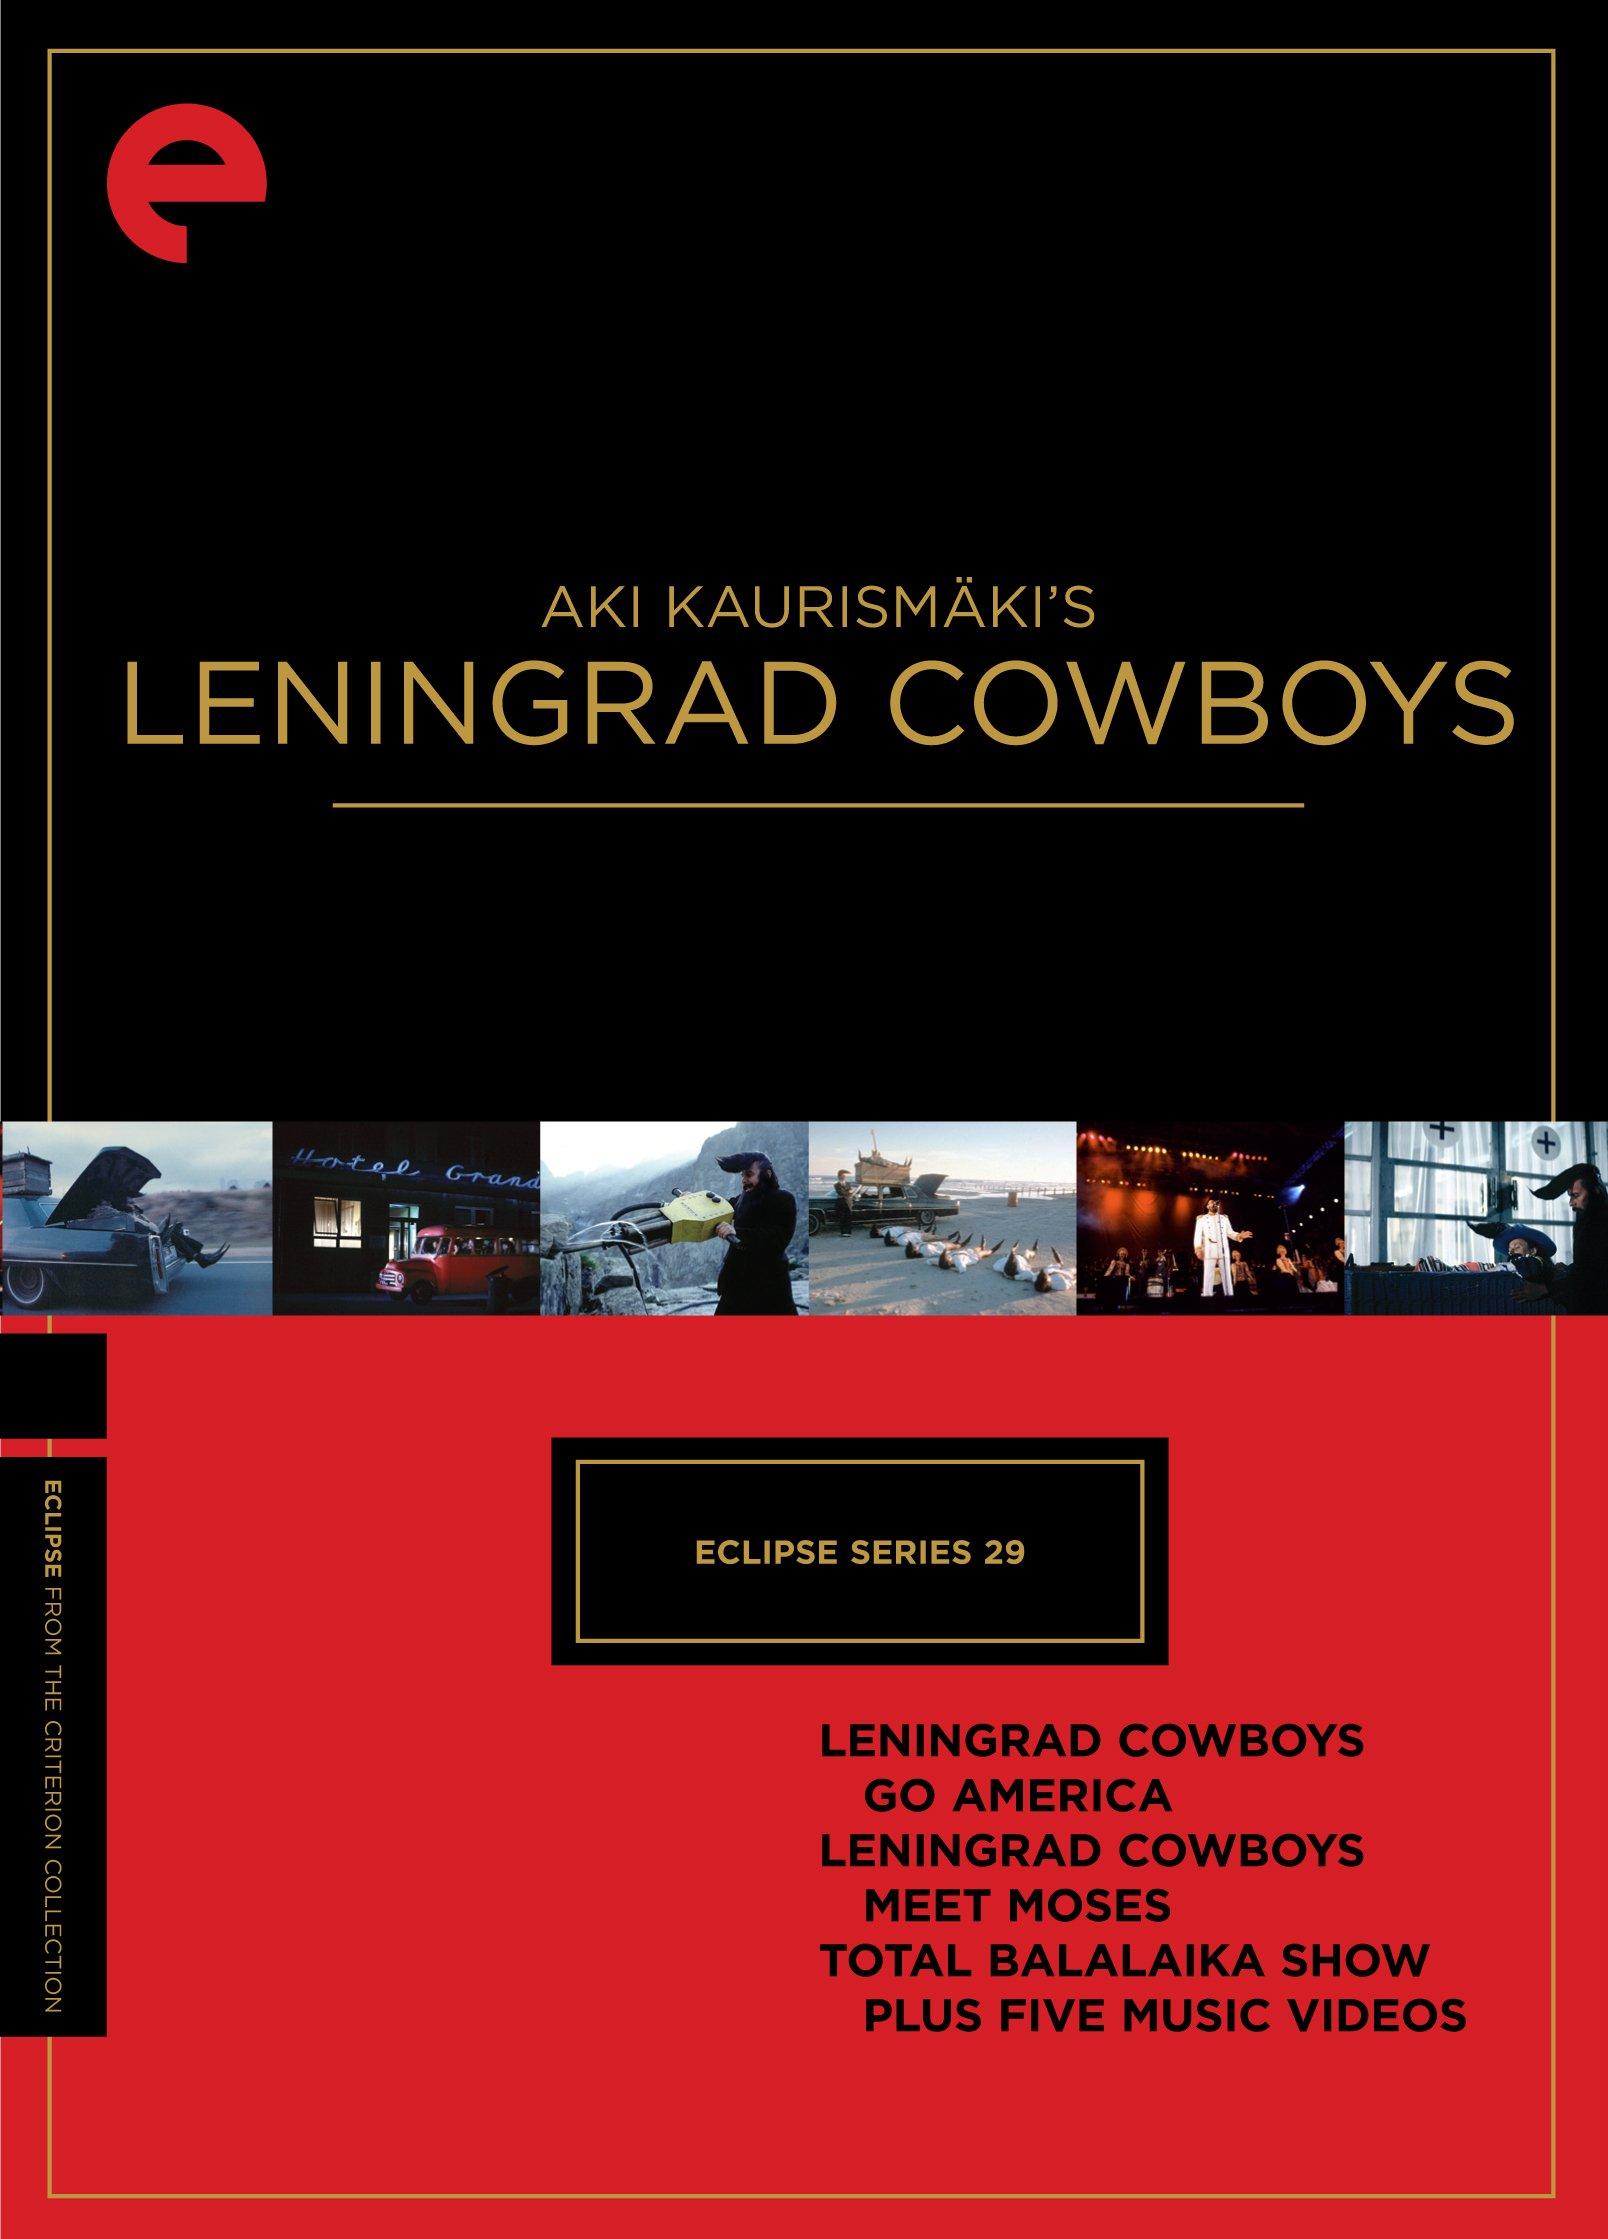 Eclipse Series 29: Aki Kaurismäki's Leningrad Cowboys (Leningrad Cowboys Go America/Leningrad Cowboys Meet Moses/Total Balalaika Show) (The Criterion Collection)